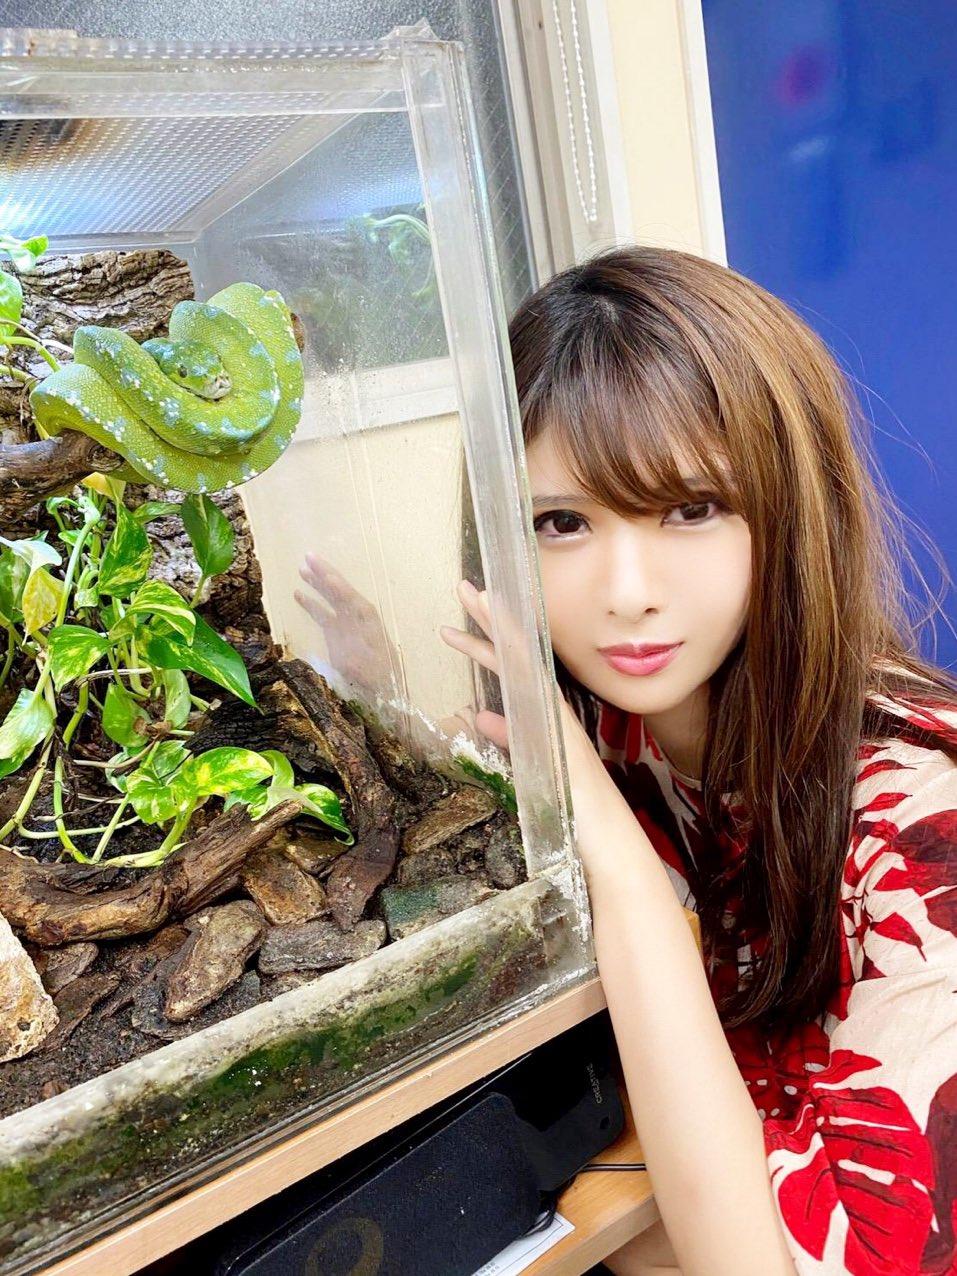 [Fitch] Miyabi Midorikawa 緑川みやび - ScanLover 2.0 - Discuss JAV & Asian Beauties!